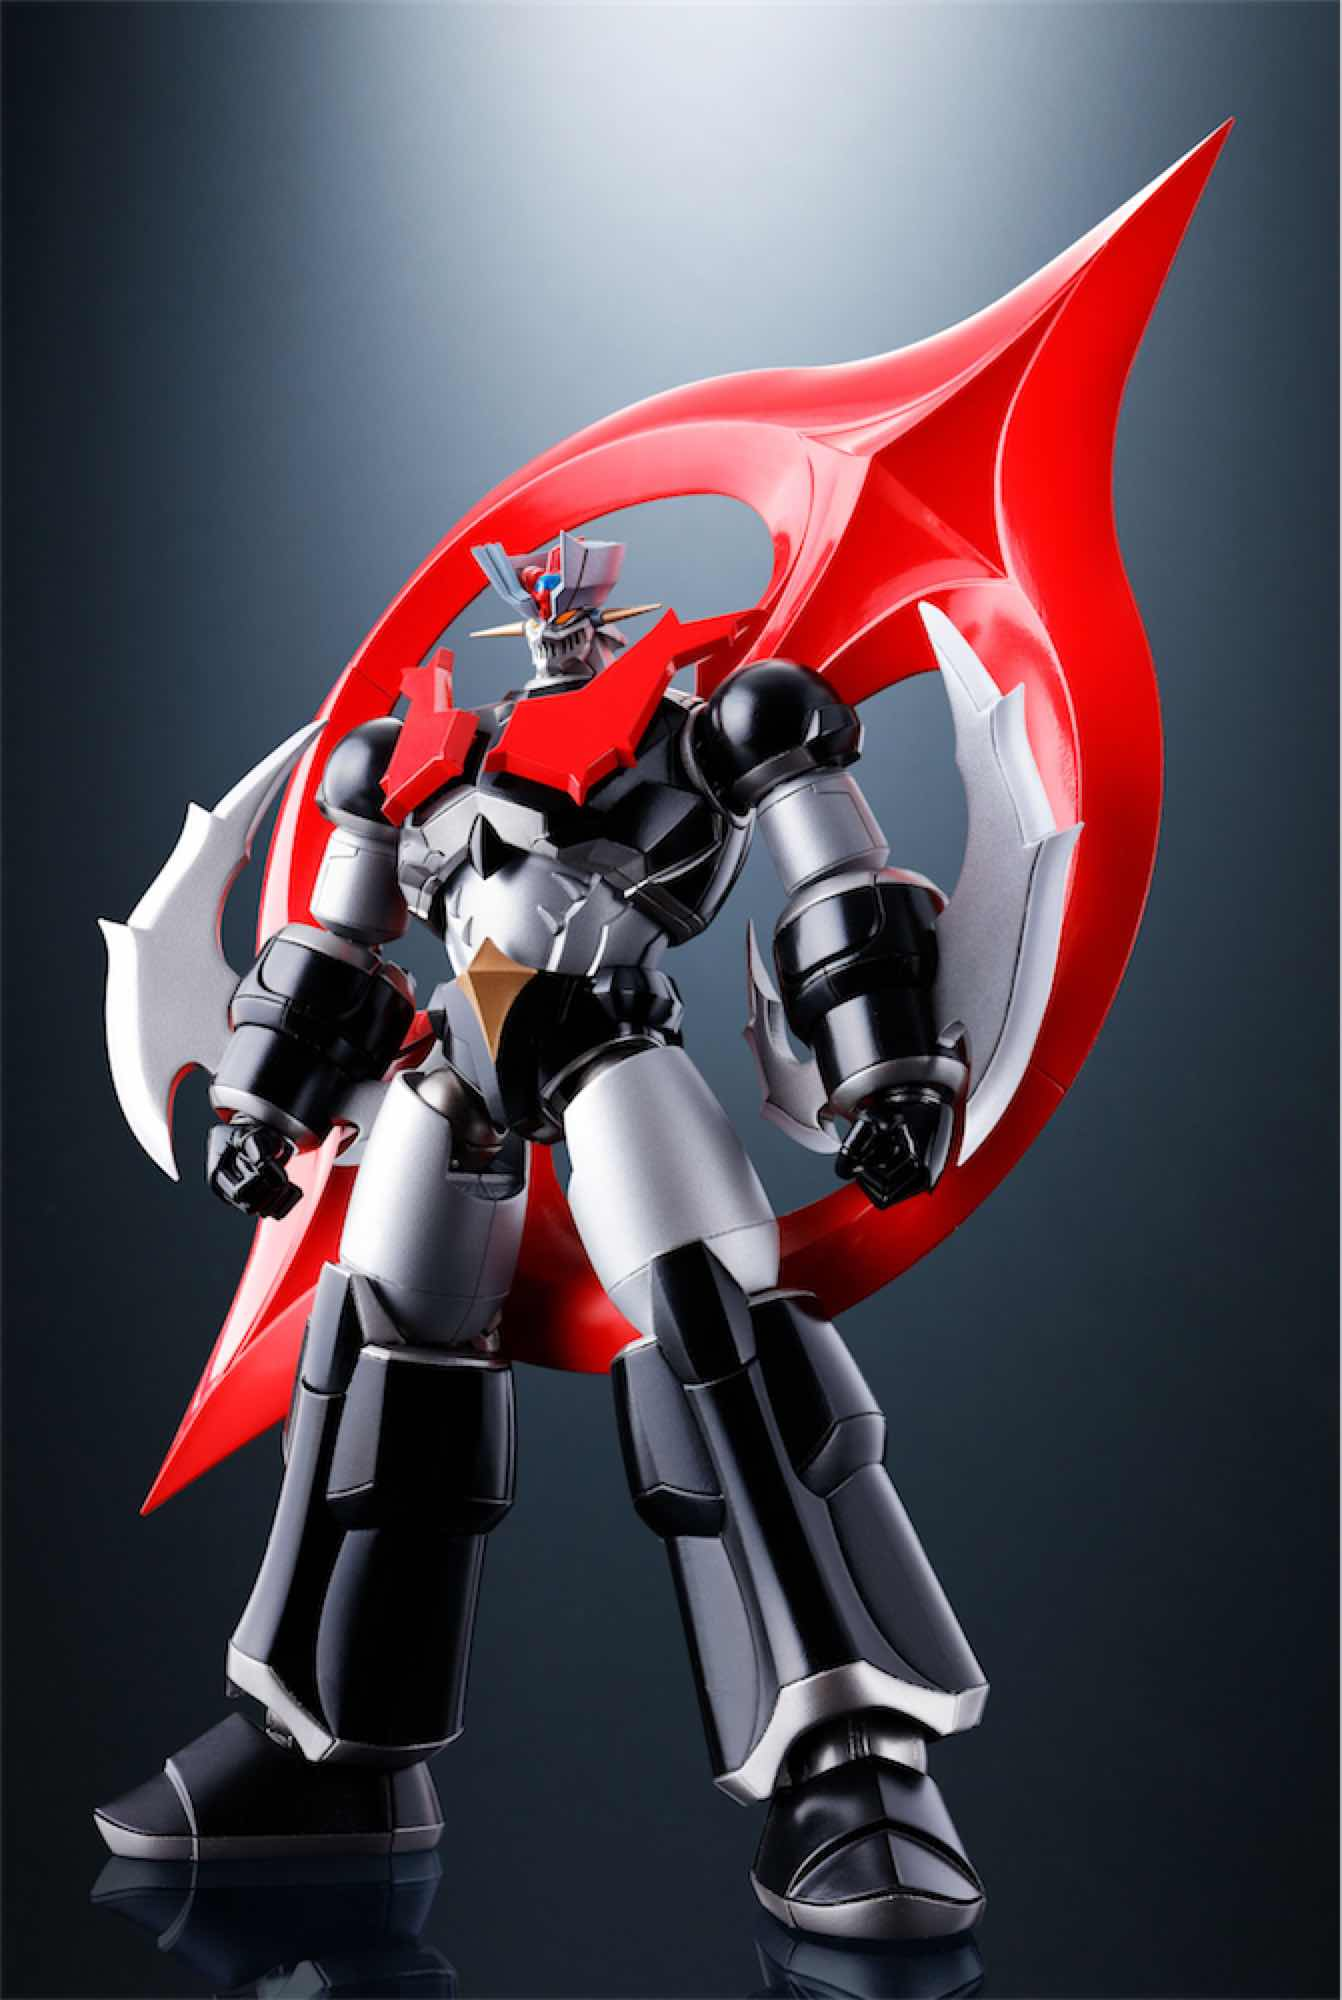 SHIN MAZINGER ZERO FIG 16.5 CM SUPER ROBOT CHOGOKIN